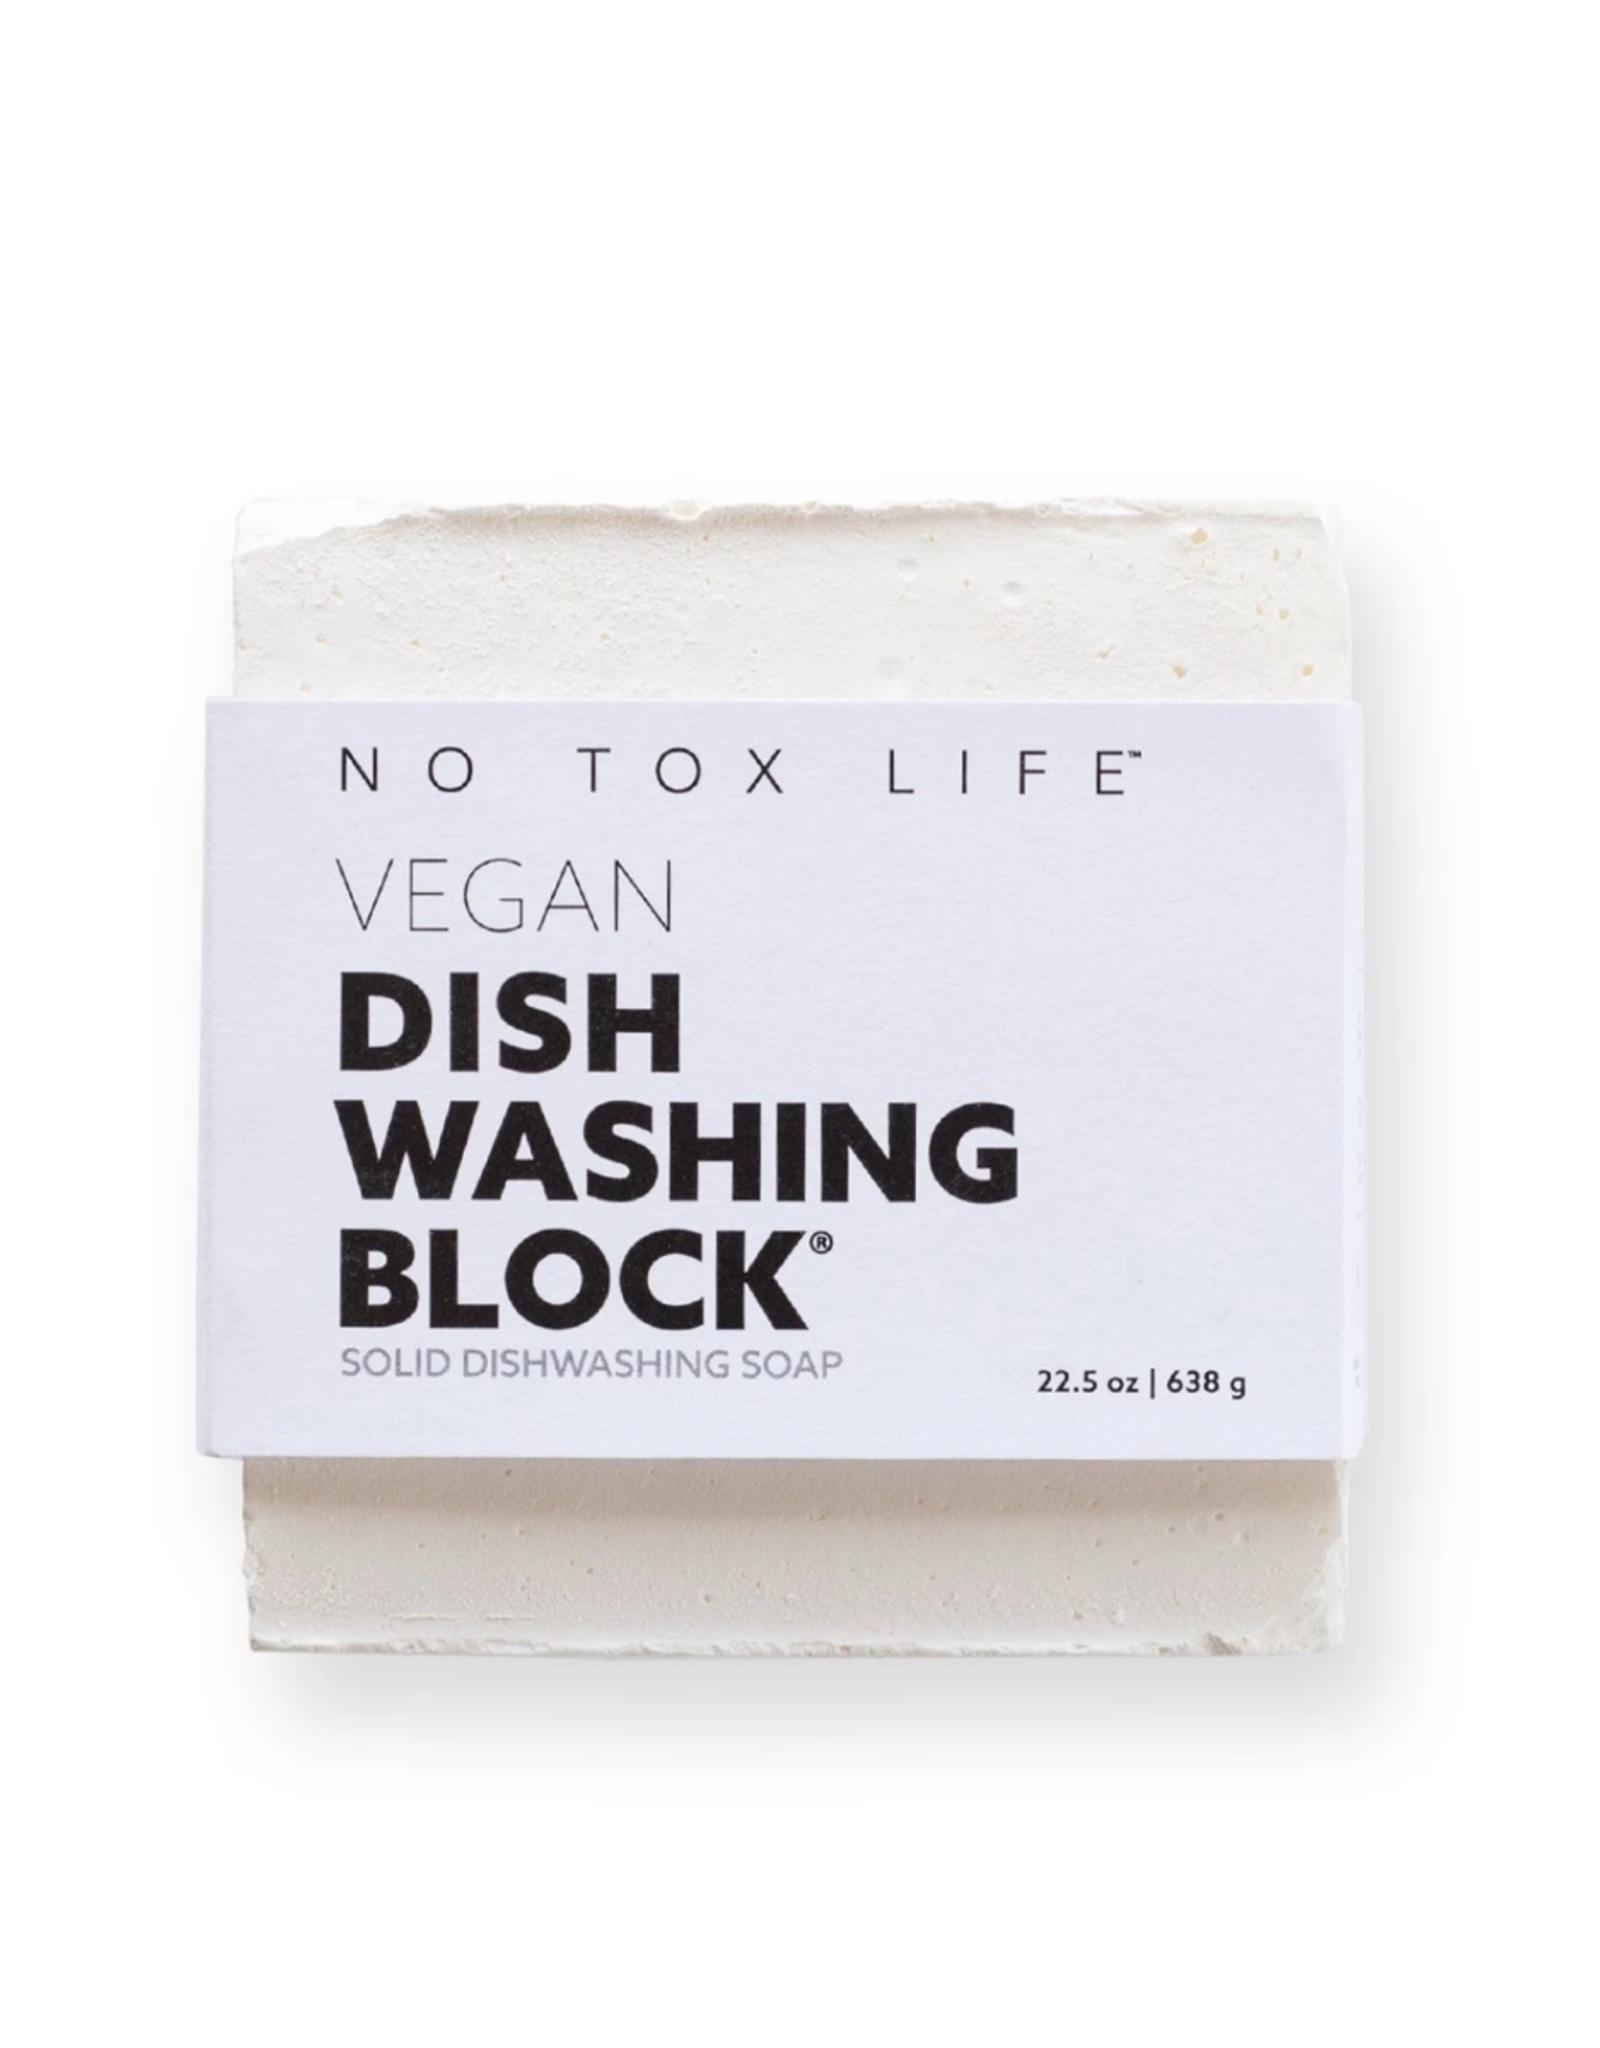 NFE - Dish Soap Block / Vegan, 22.5oz